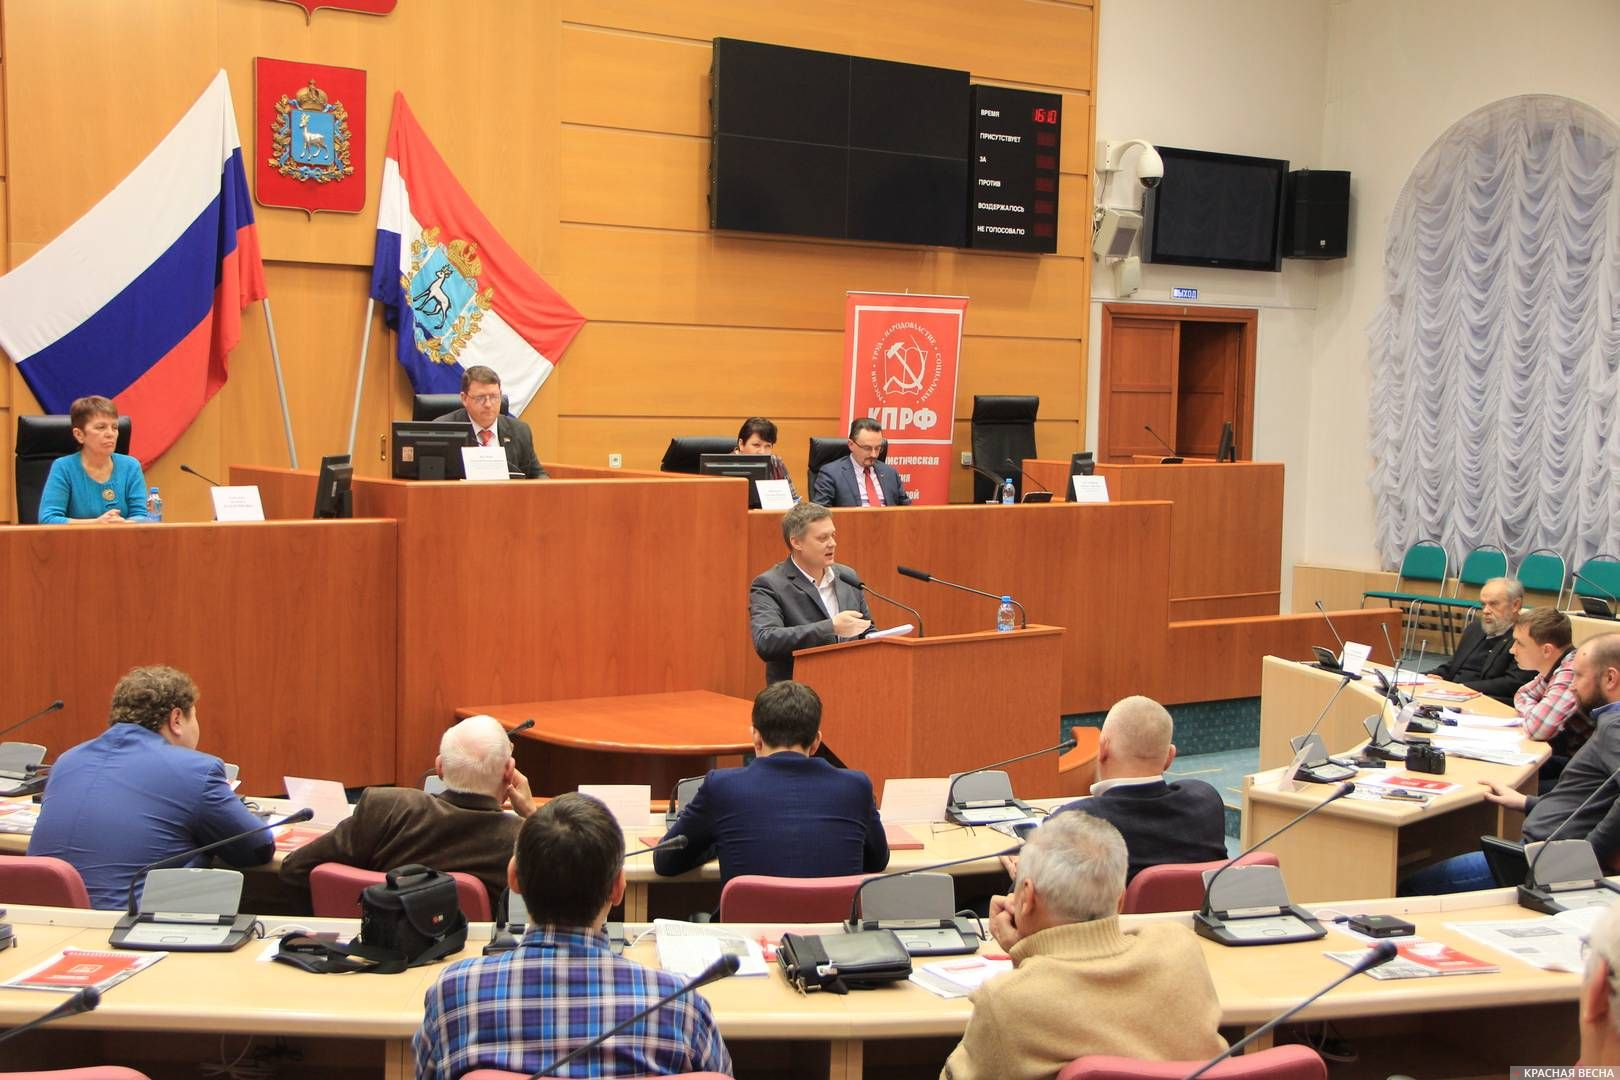 Доклад Сергея Боброва, координатора самарской ячейки «Сути времени»